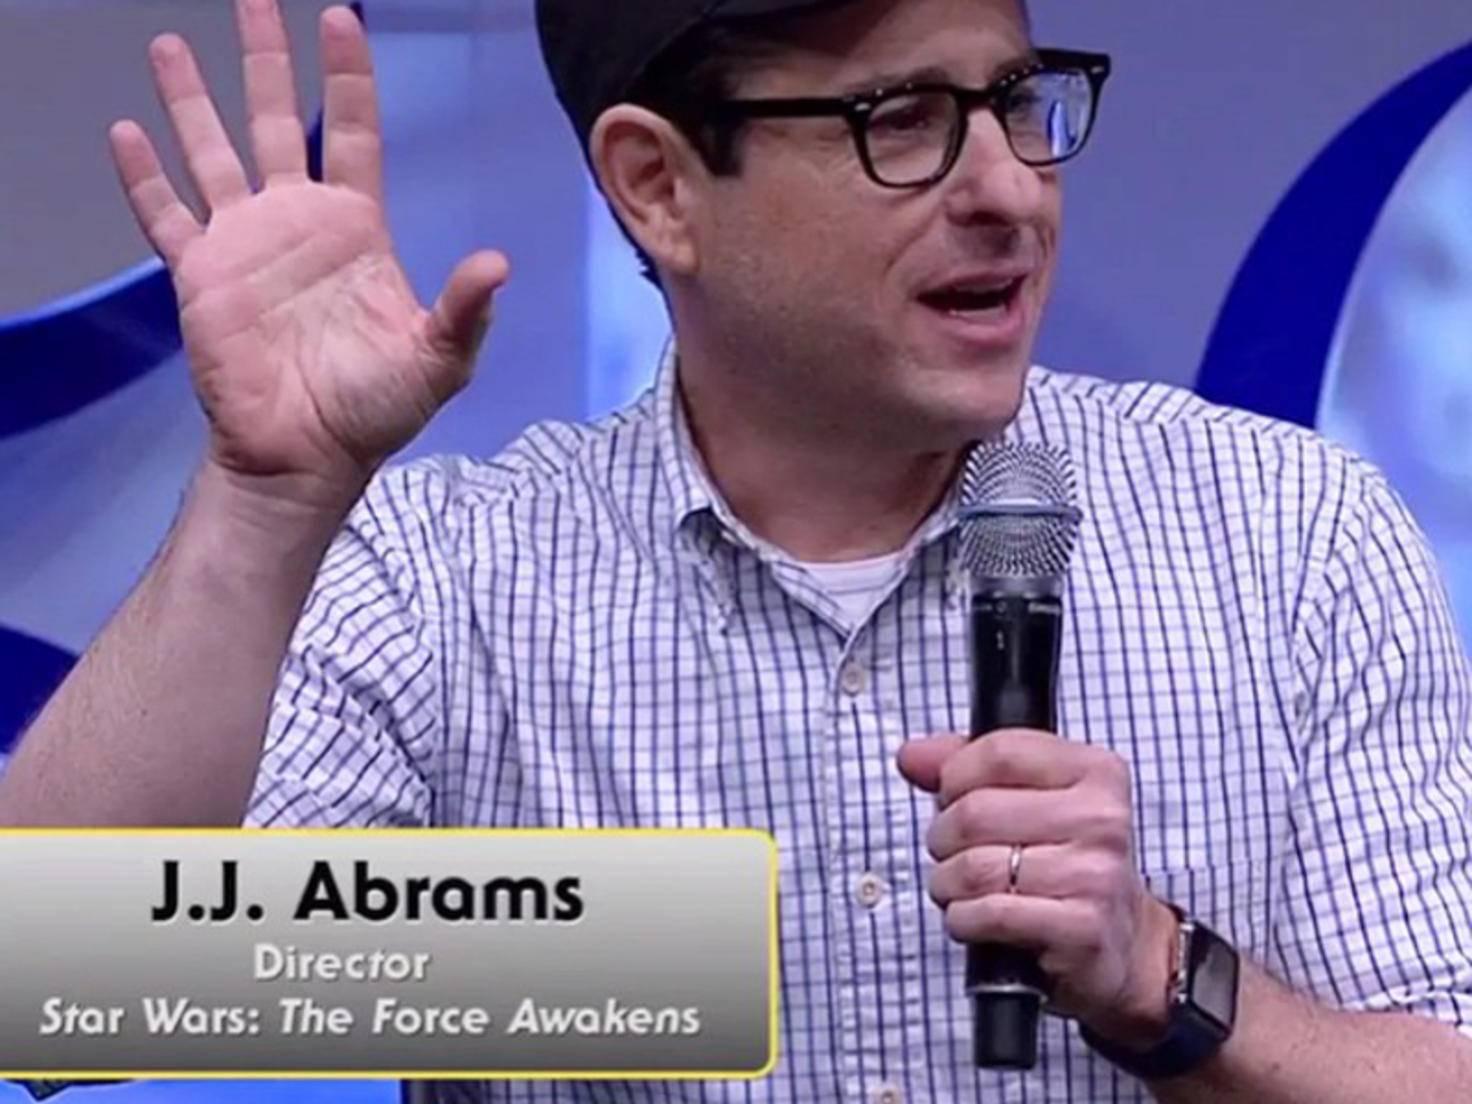 J.J. Abrams mit Apple Watch